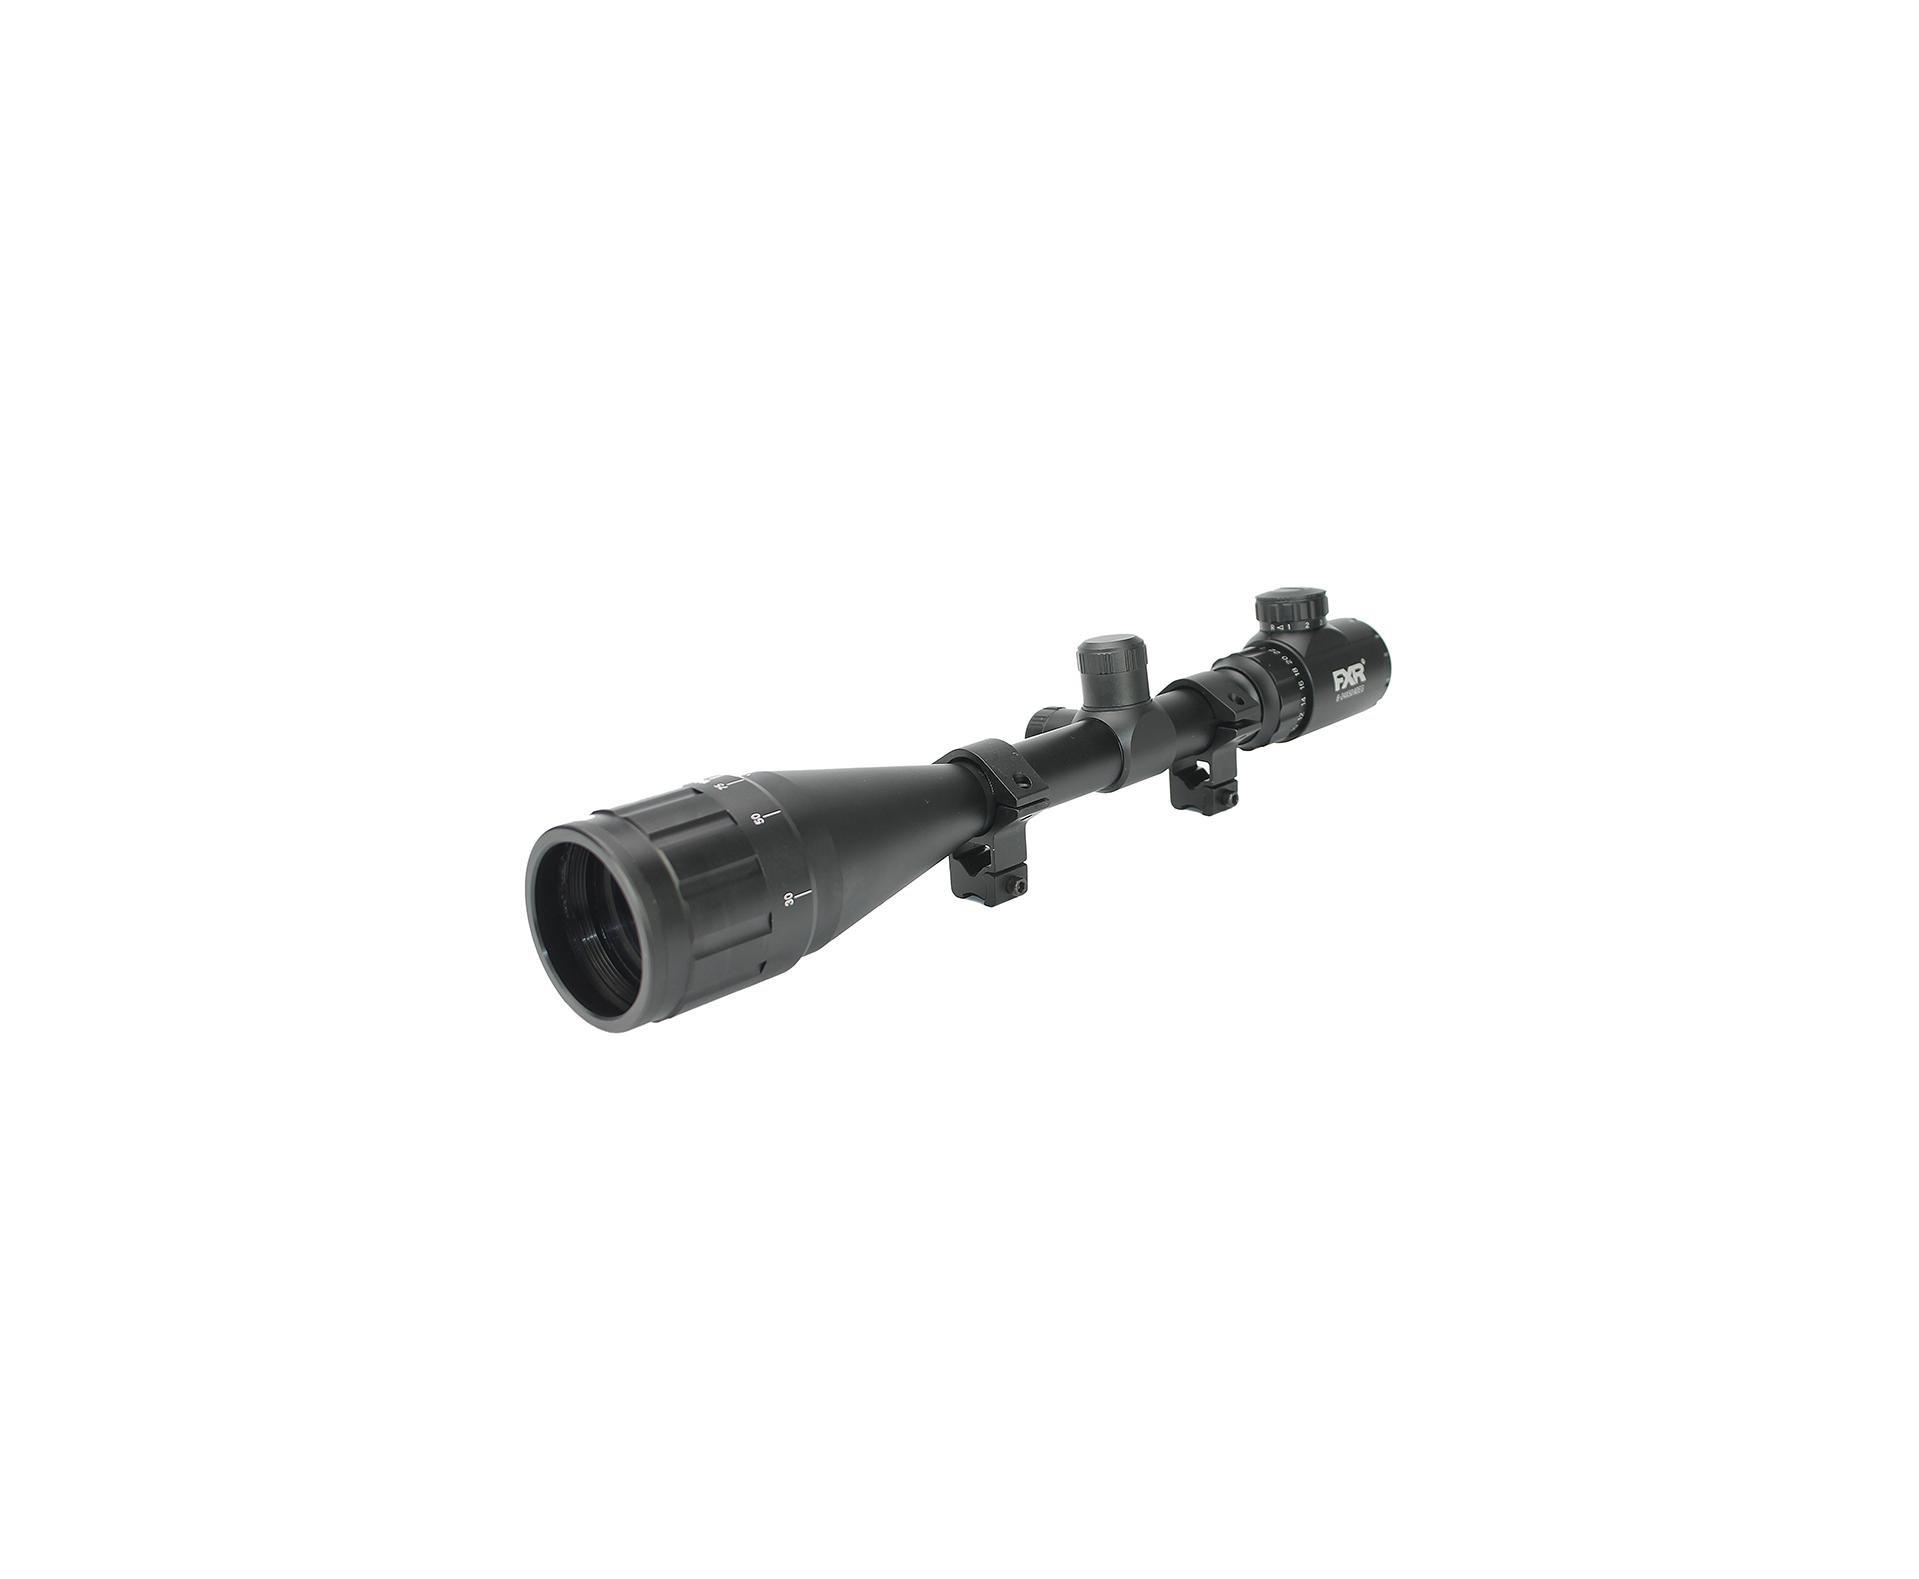 Carabina De Pressão Pcp M25 Thunder Black 5.5mm Artemis Fxr + Luneta 6-24x50ao + Mount Anti Impacto - Fxr